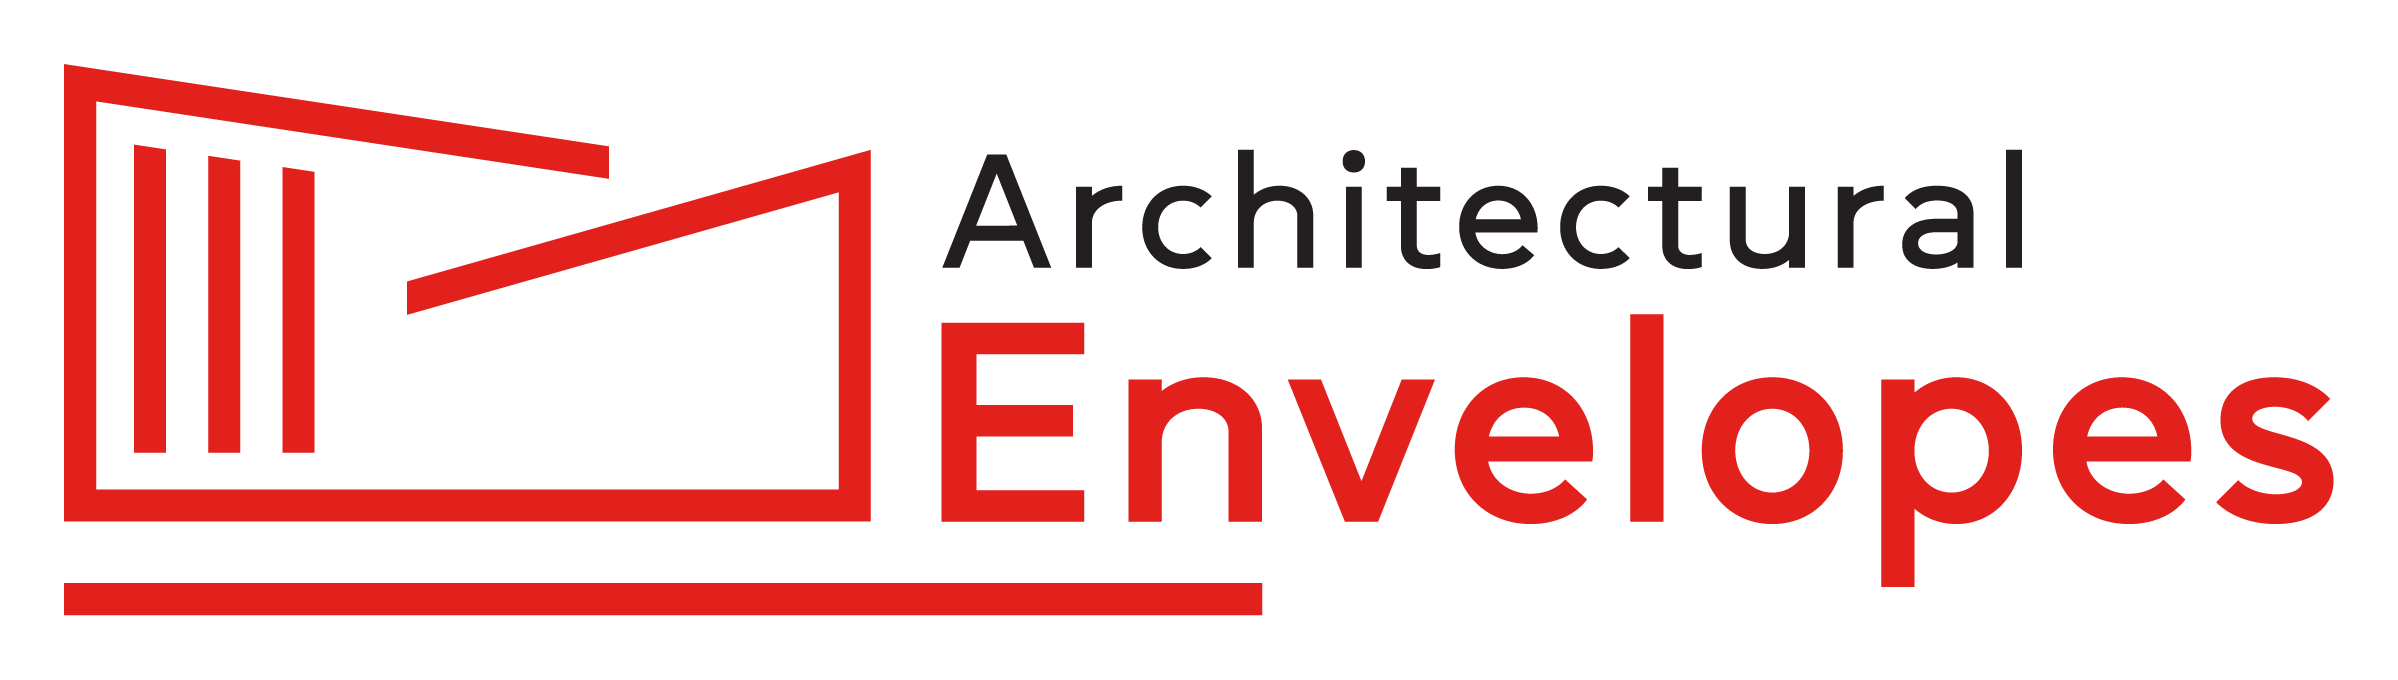 Architectural Envelopes